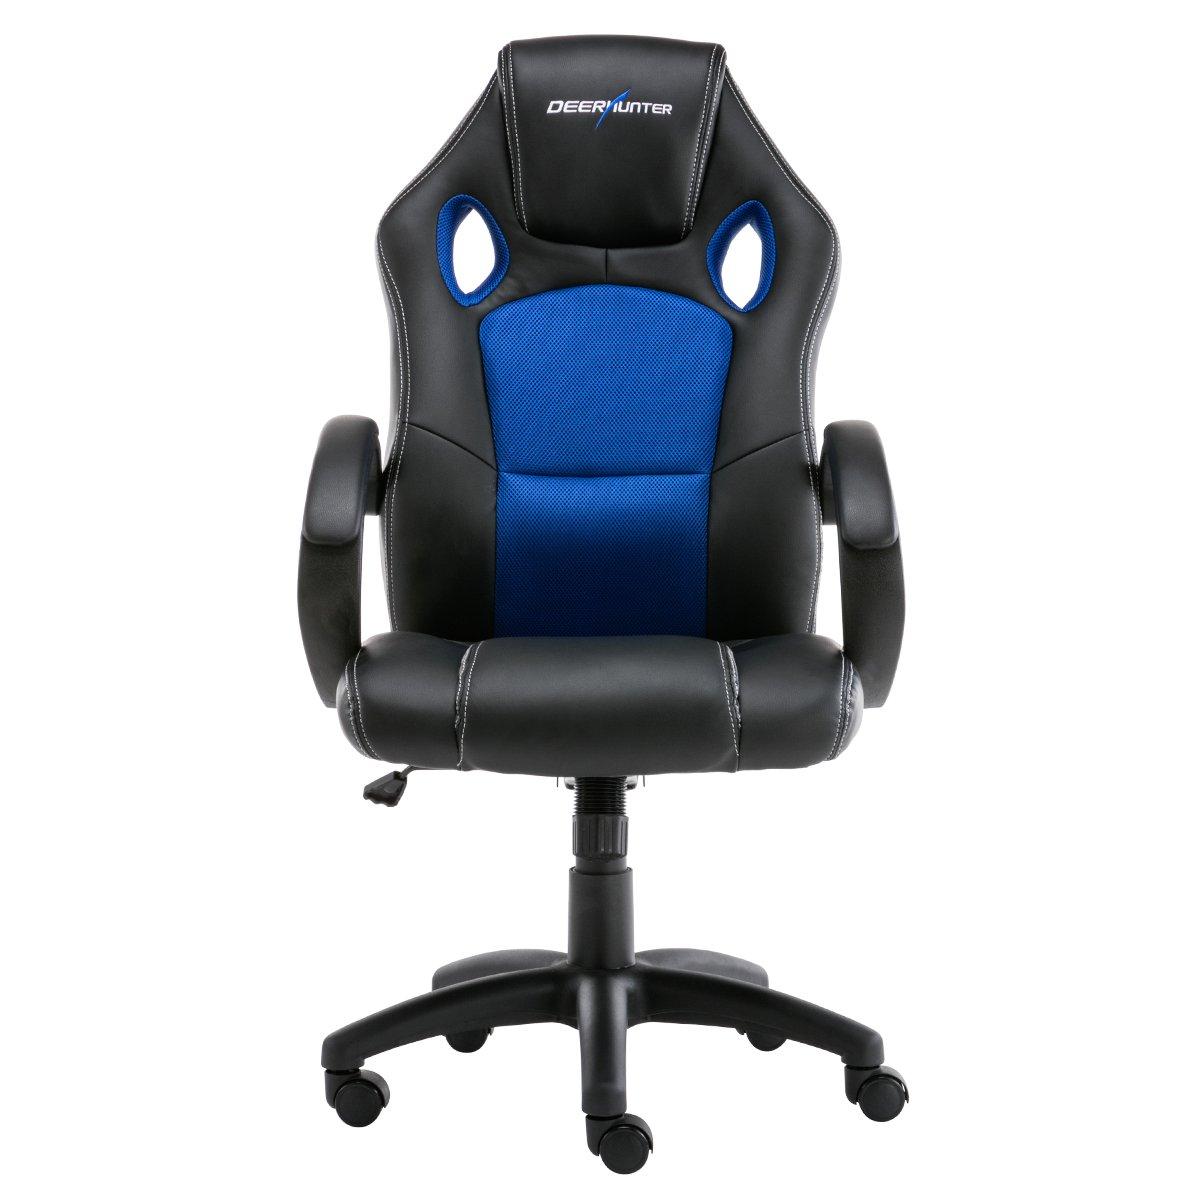 Deerhunter Gaming Chair, Leather Office Chair, Ergonomic Racing Chair, Adjustable Computer Desk Swivel Chair - Blue